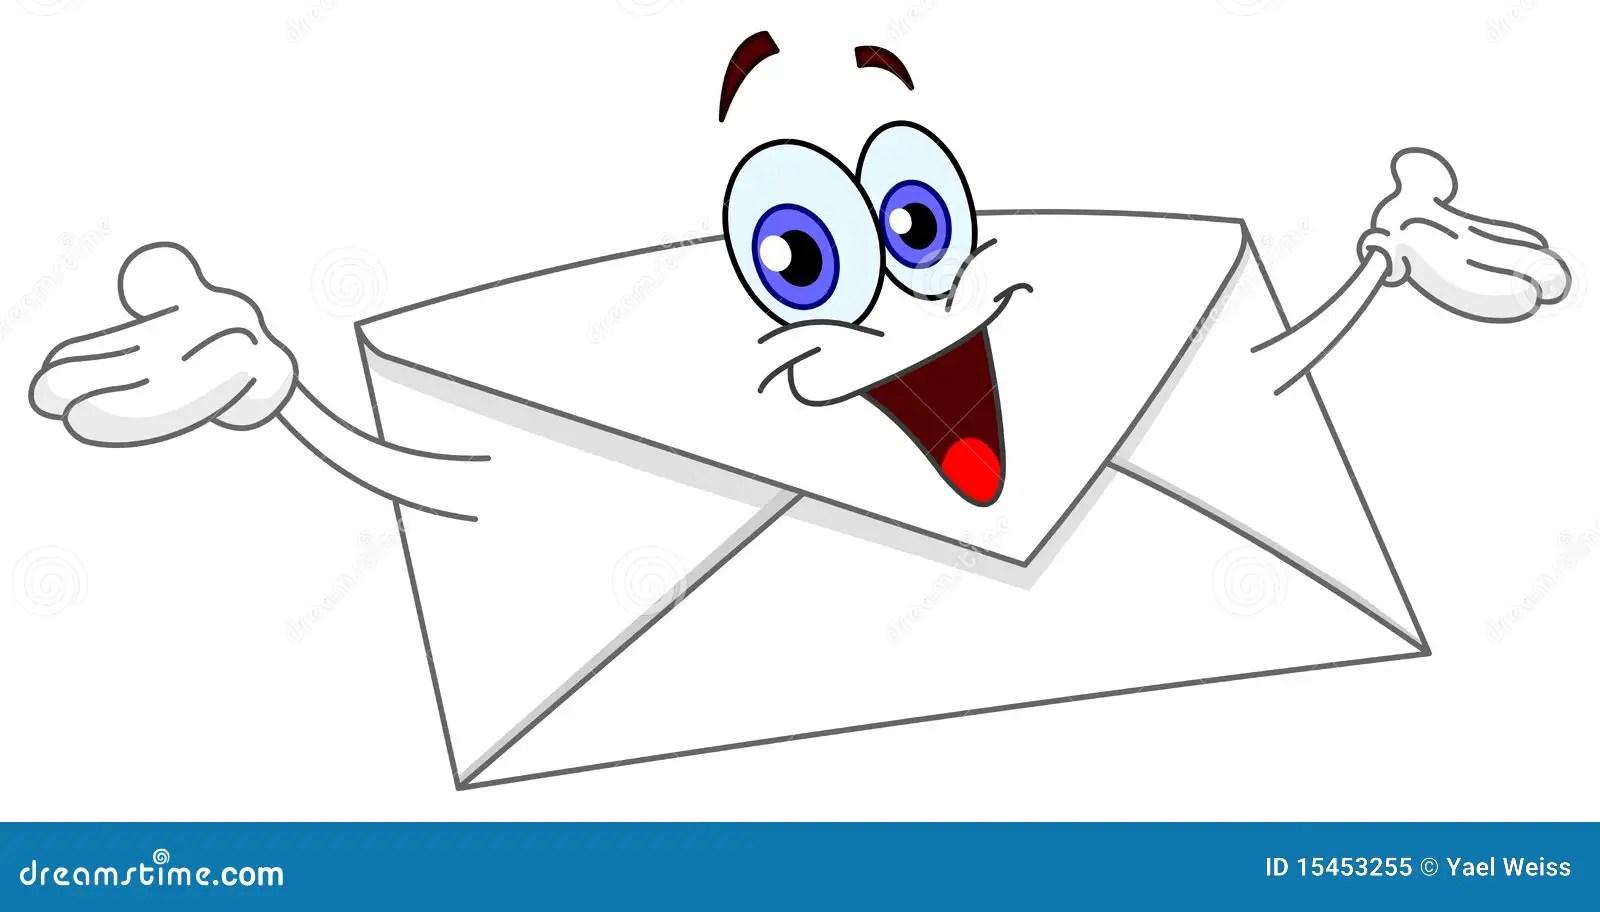 Envelope Royalty Free Stock Photo  Image 15453255